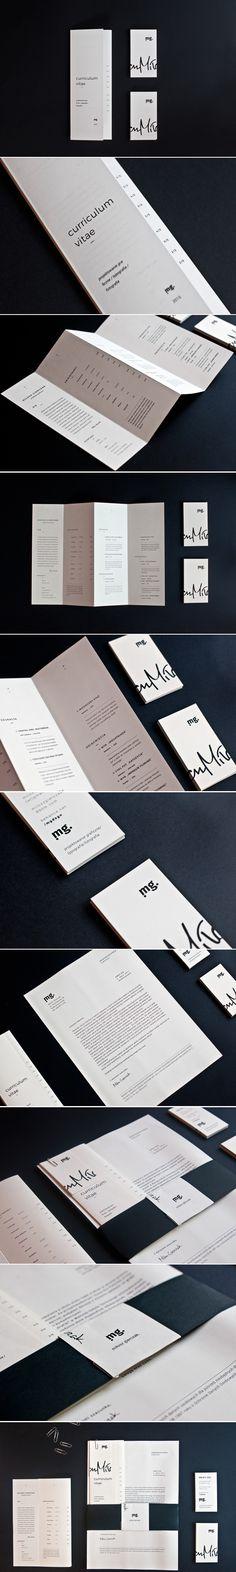 CV folder (mailer) - Quad'fold brochure - Self prom.